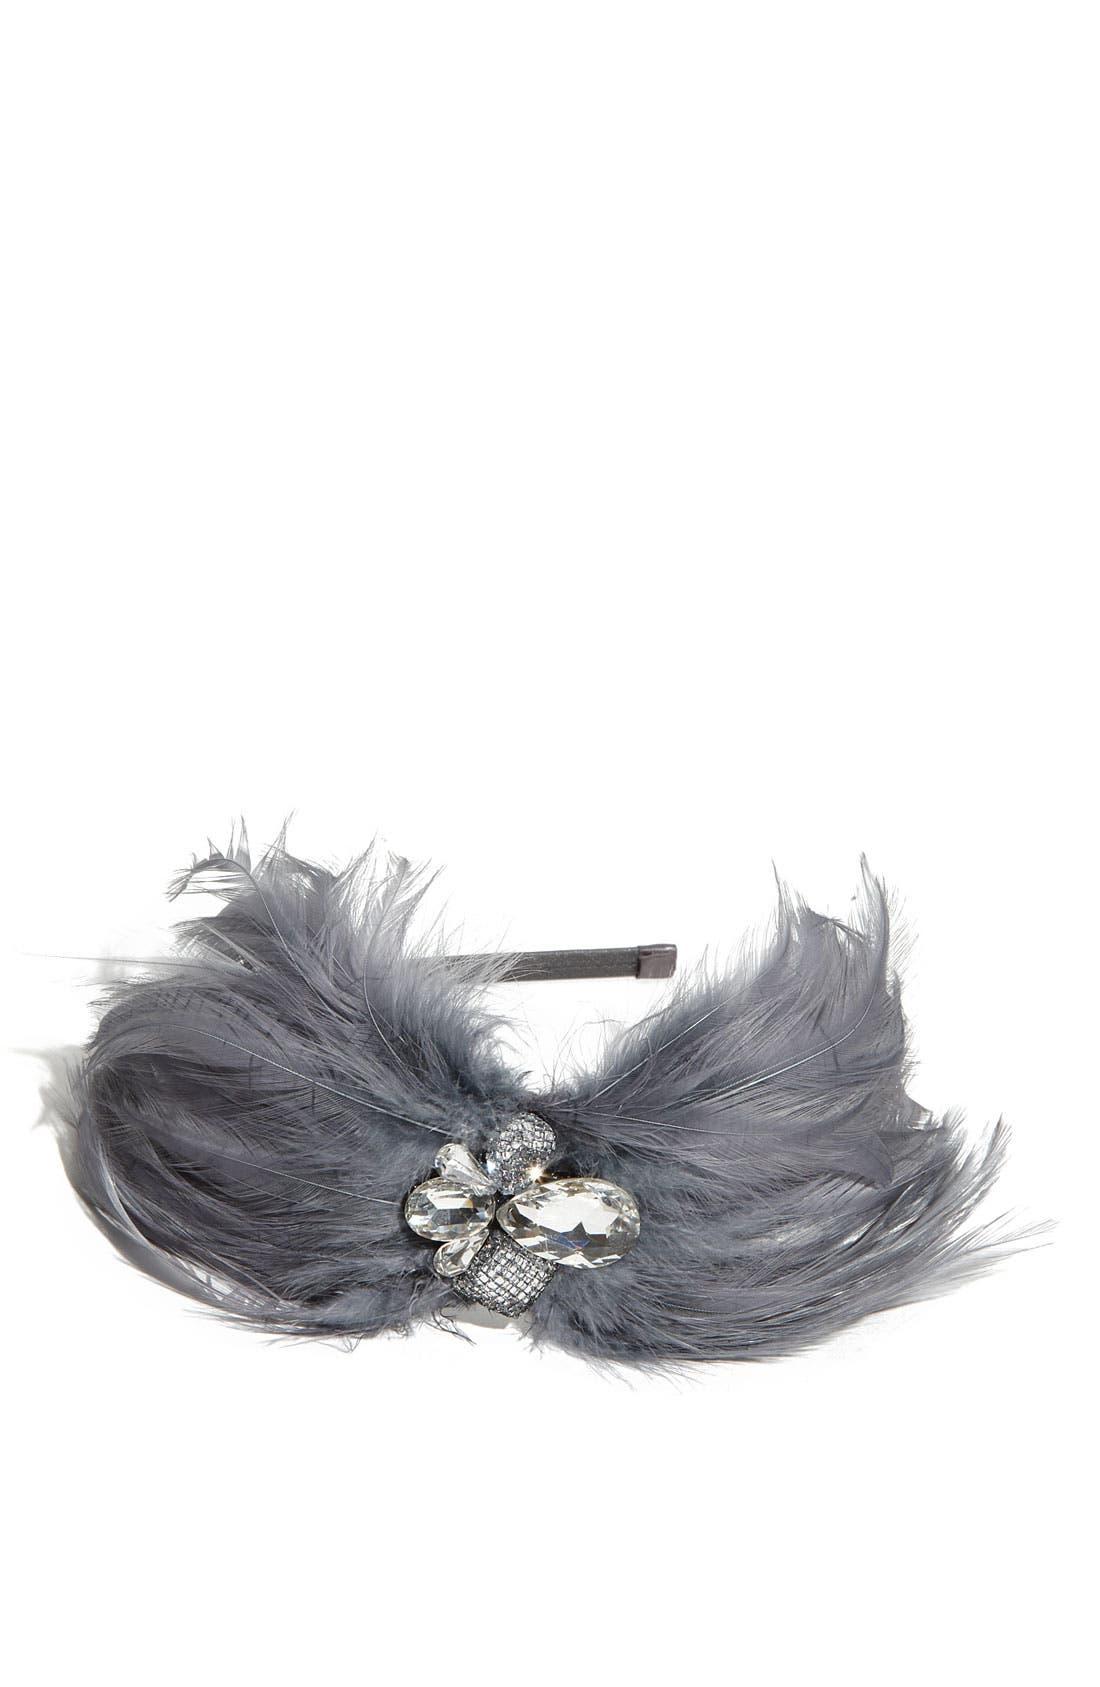 Main Image - Tasha 'Dreamy Bird' Fascinator Headband